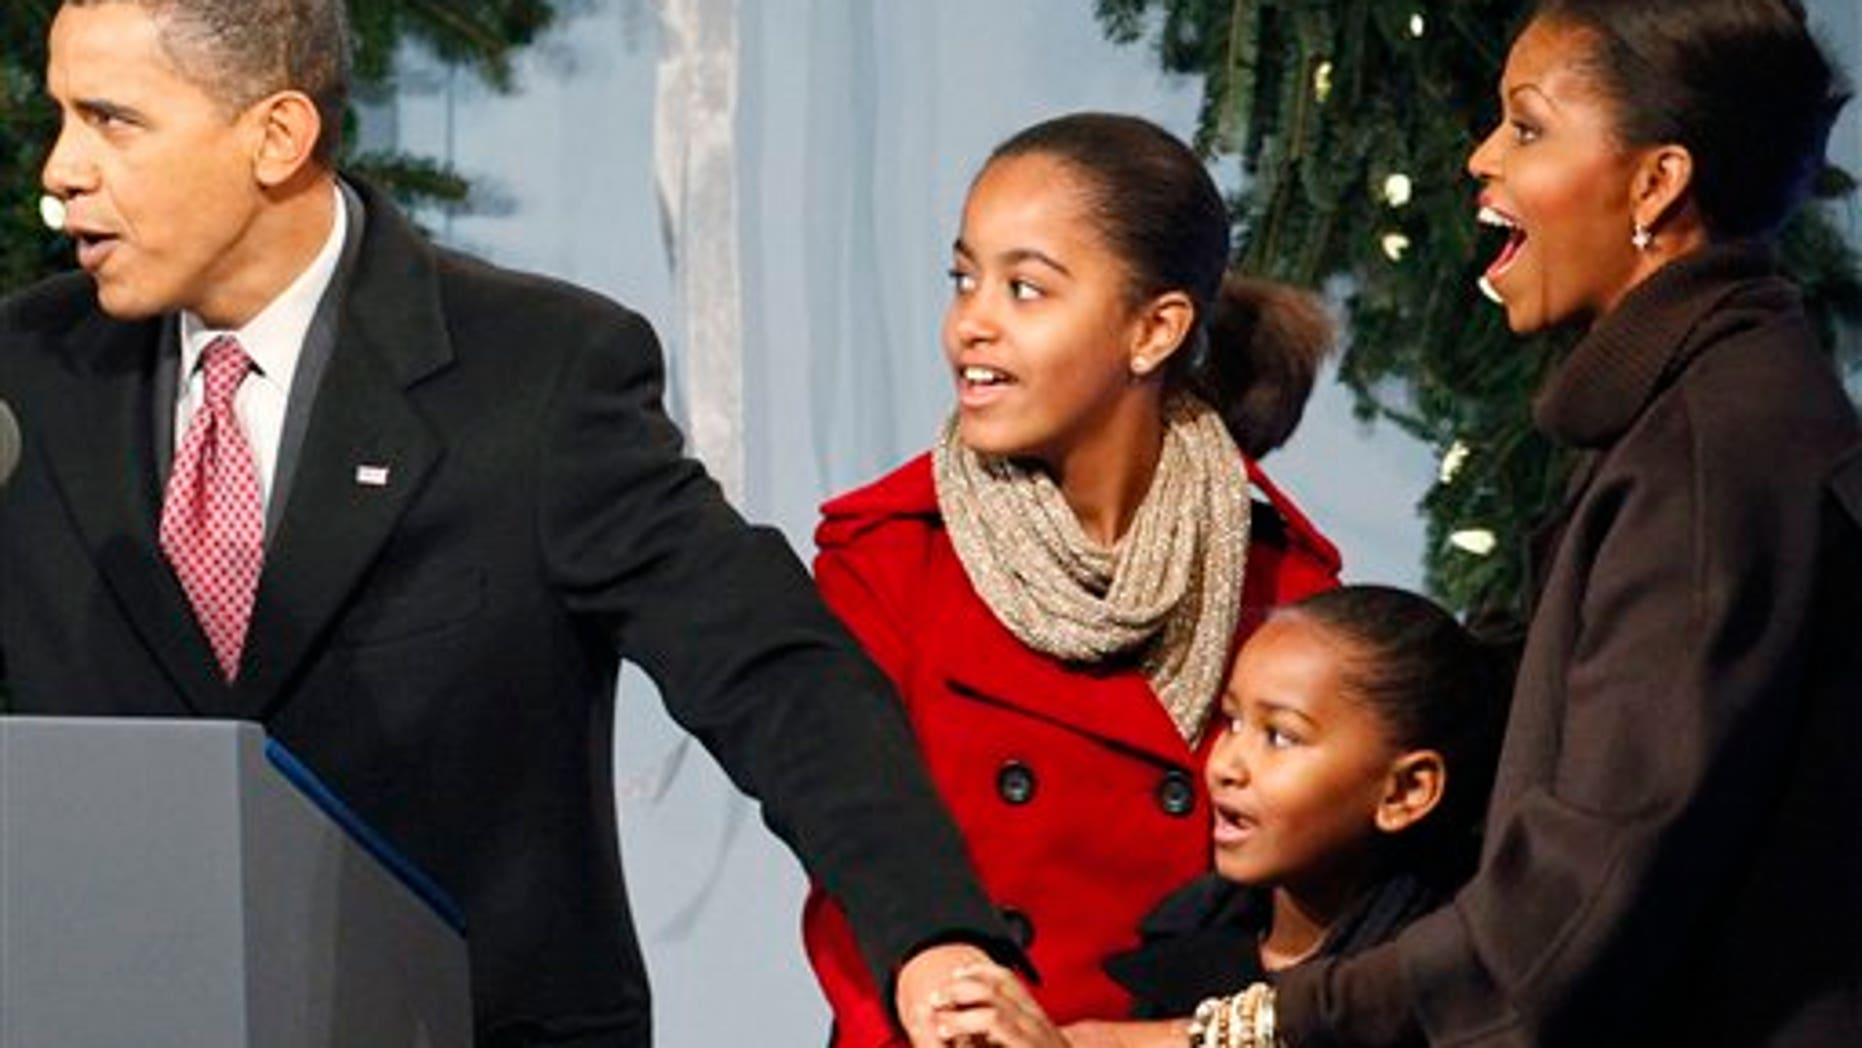 President Barack Obama, first lady Michelle Obama and daughters Sasha and Malia help to light the National Christmas Tree, Thursday, Dec. 3, 2009, in Washington. (AP Photo/Haraz N. Ghanbari)